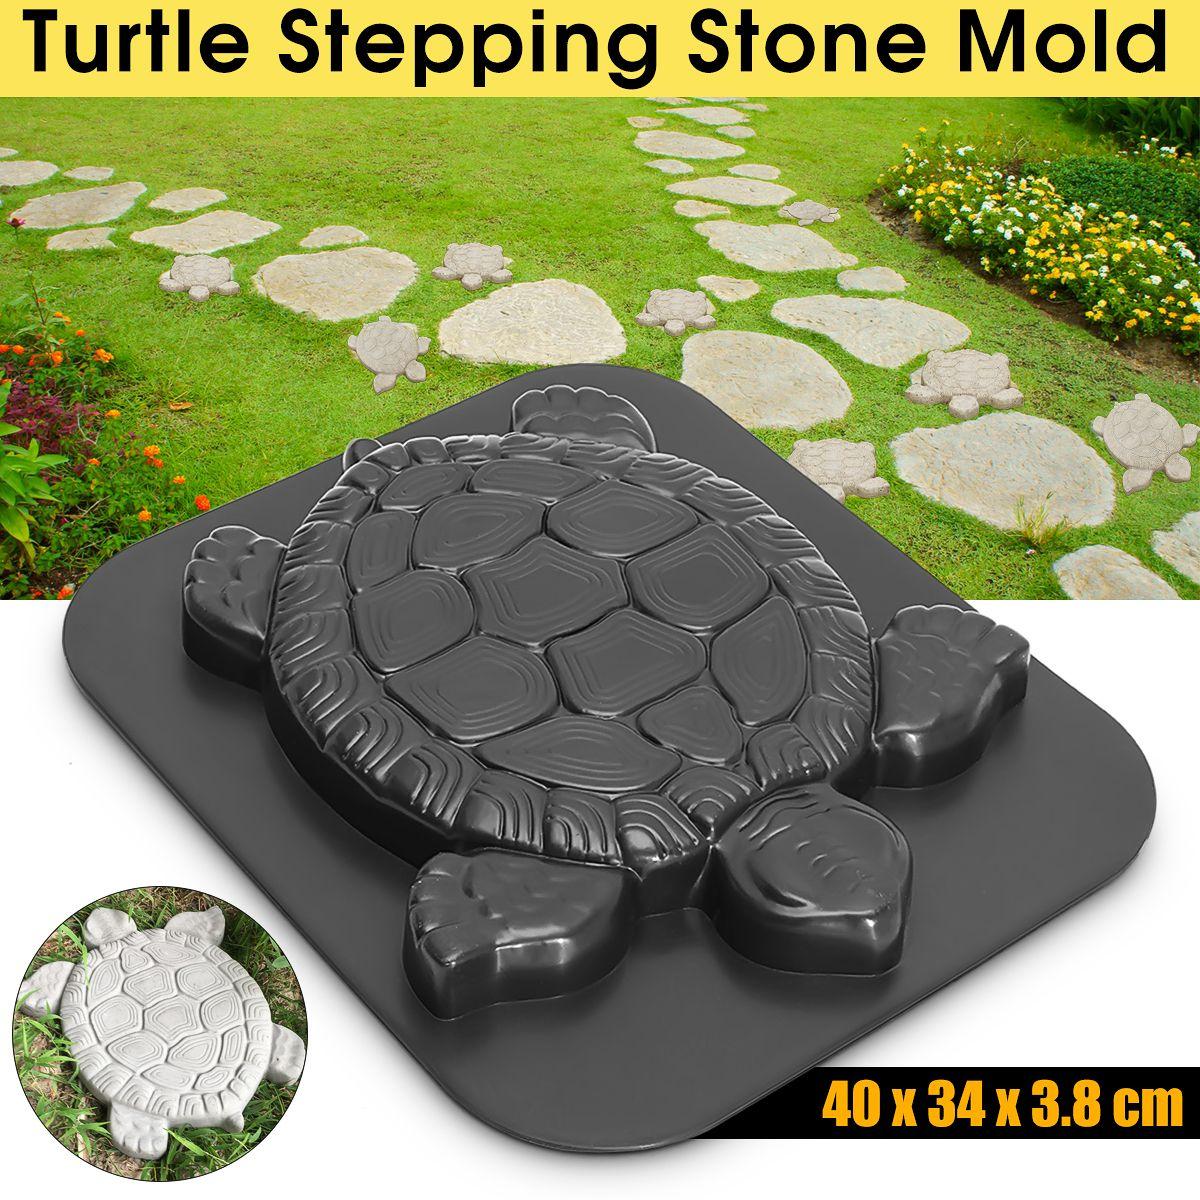 44CM Turtle Stepping Stone Mold Path Maker Walk Maker Pavement Concrete Cement Mould ABS Tortoise For Garden Decor